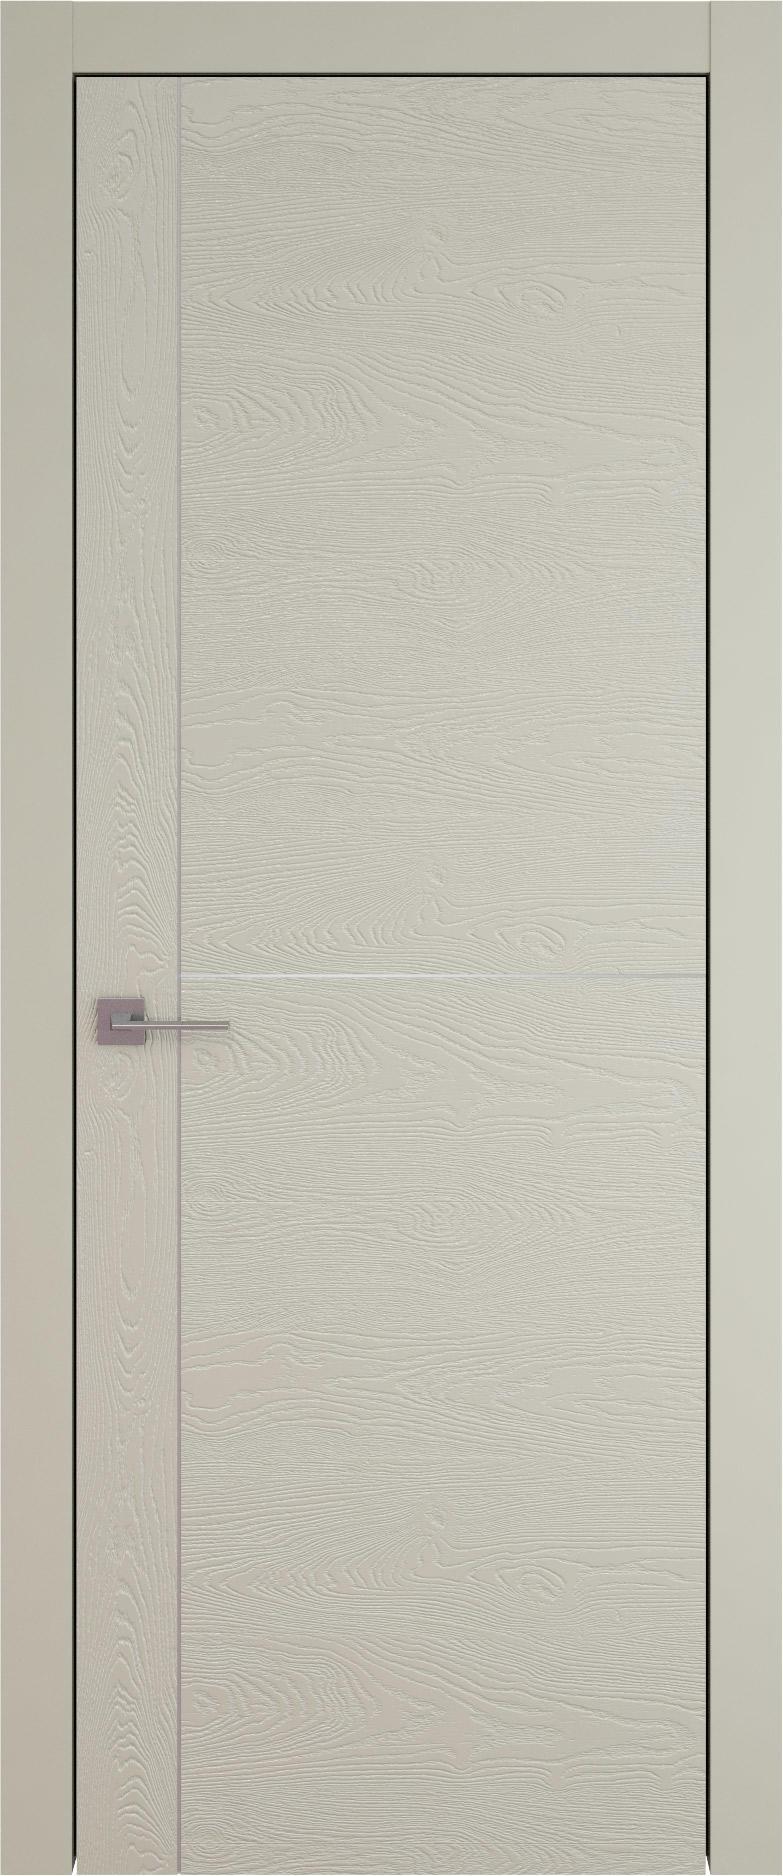 Tivoli Е-3 цвет - Серо-оливковая эмаль по шпону (RAL 7032) Без стекла (ДГ)